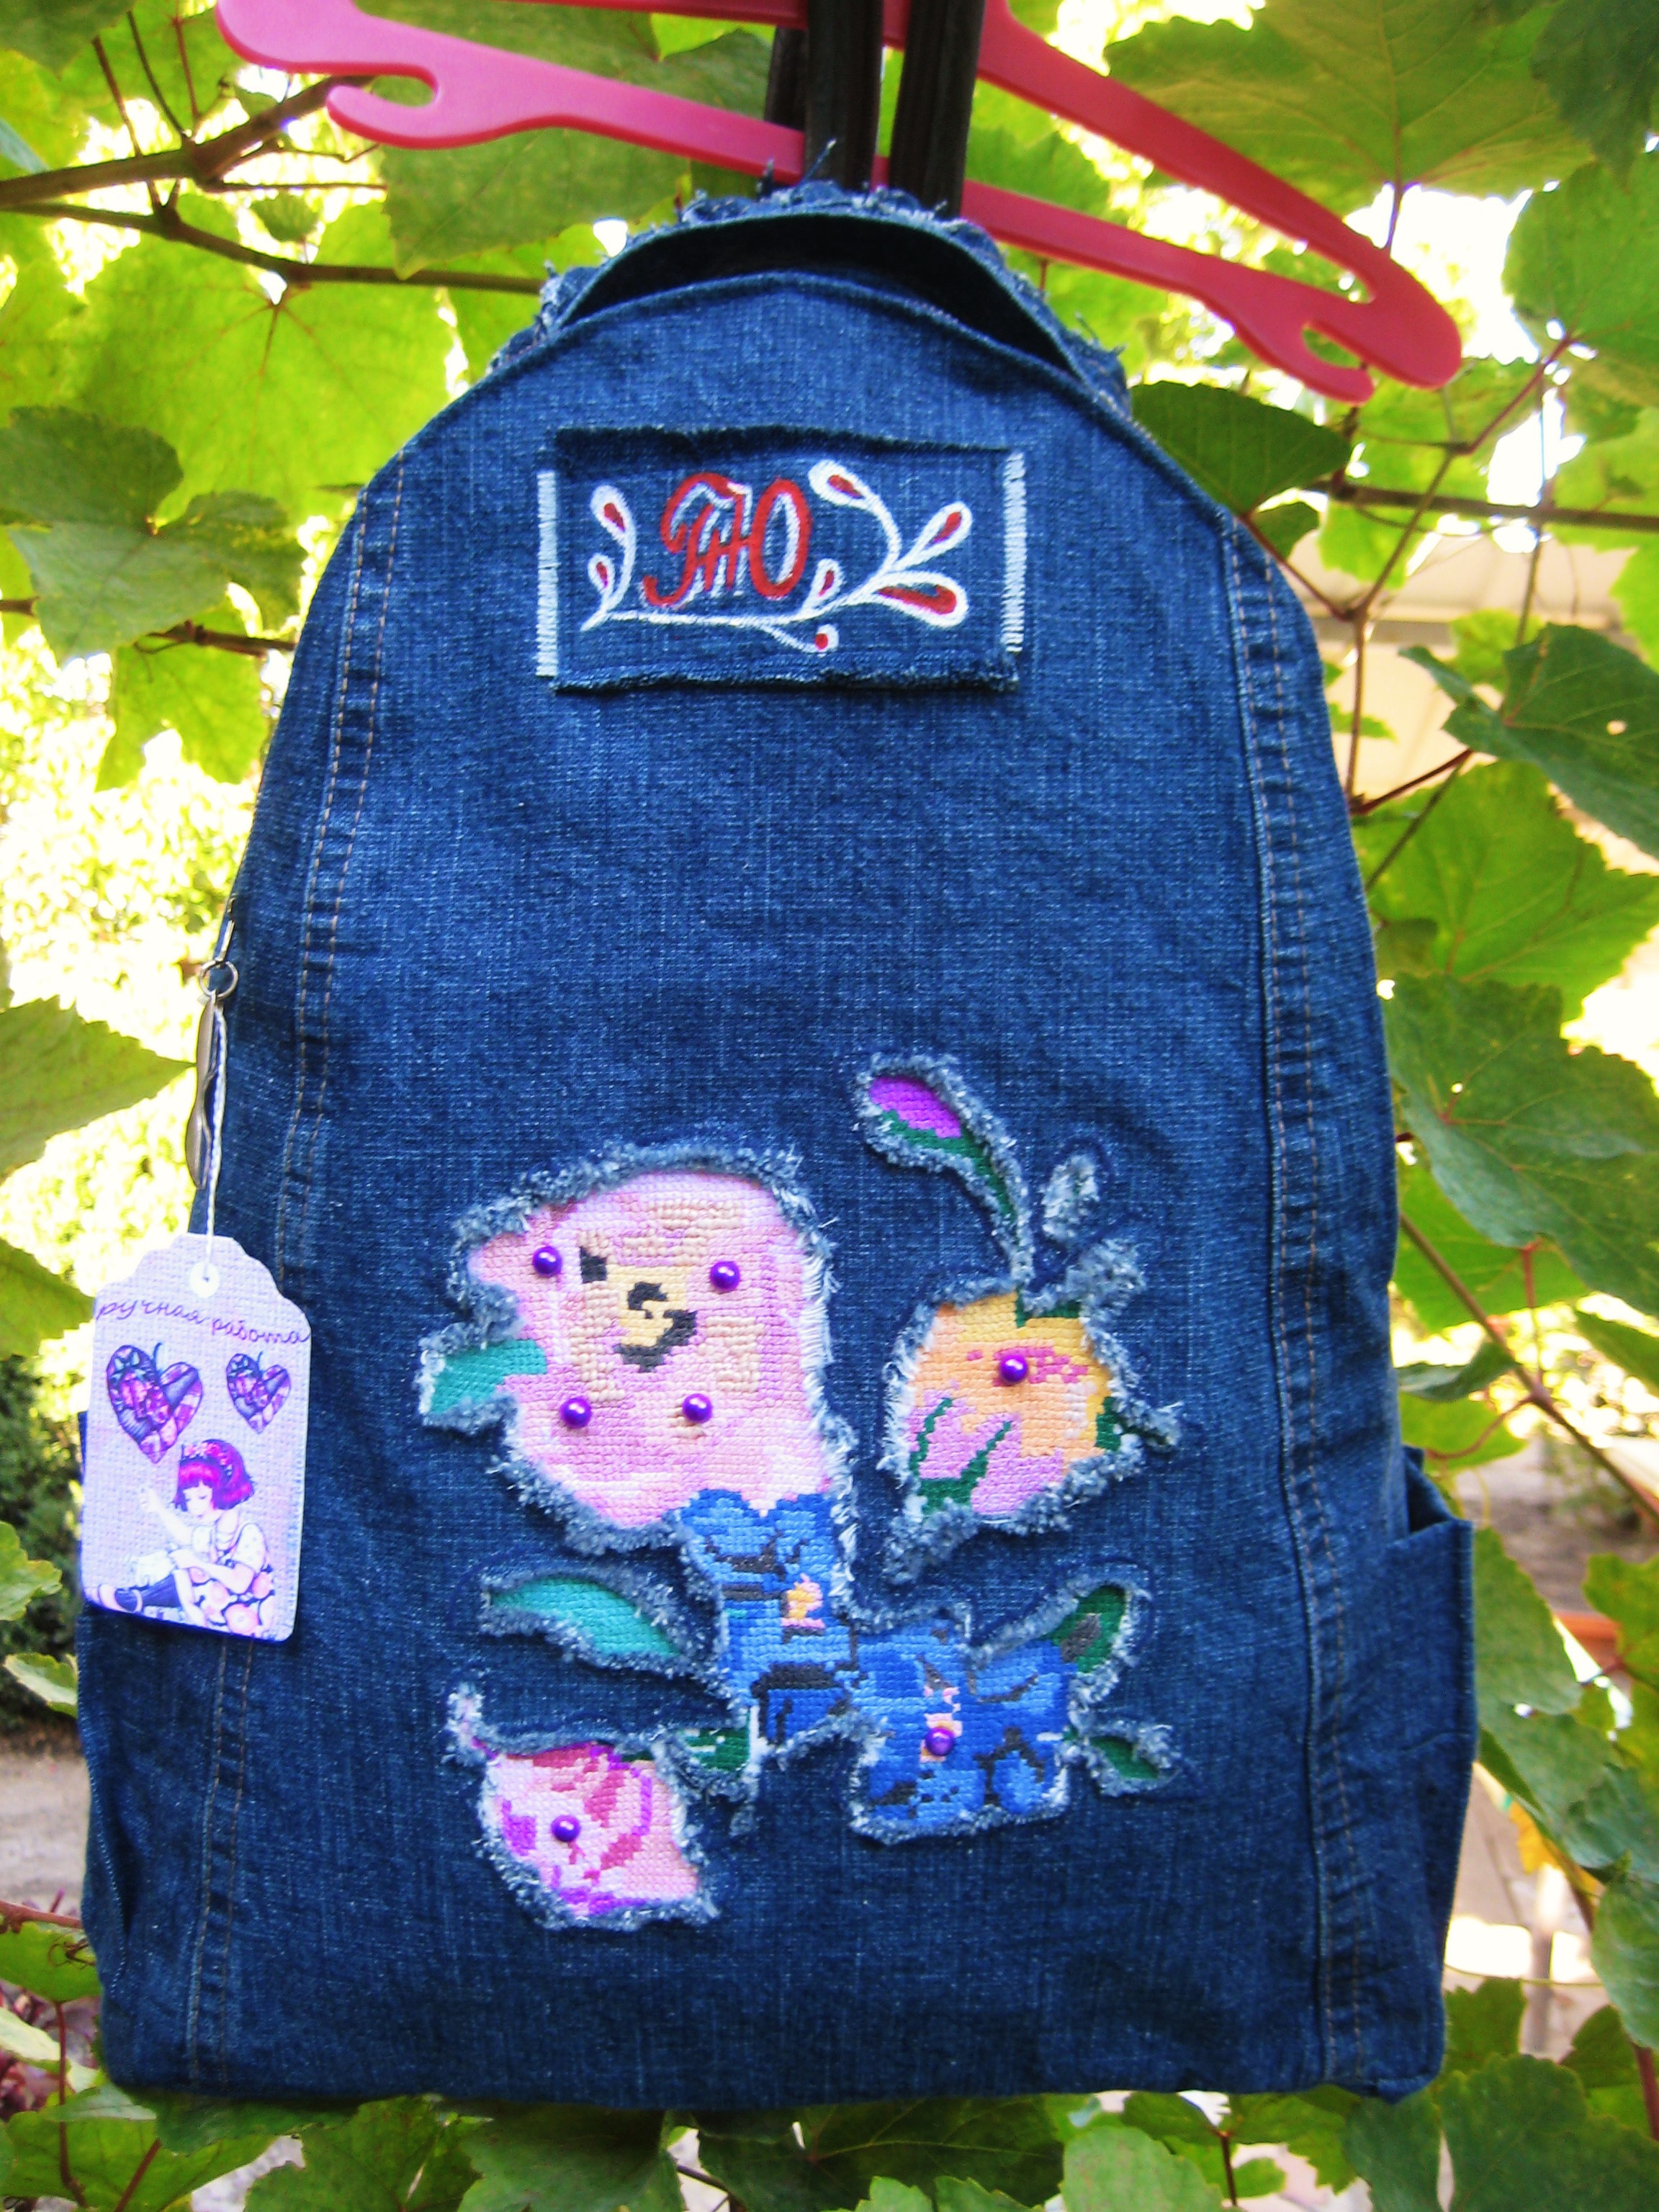 Вышивка на джинсовом рюкзаке 97